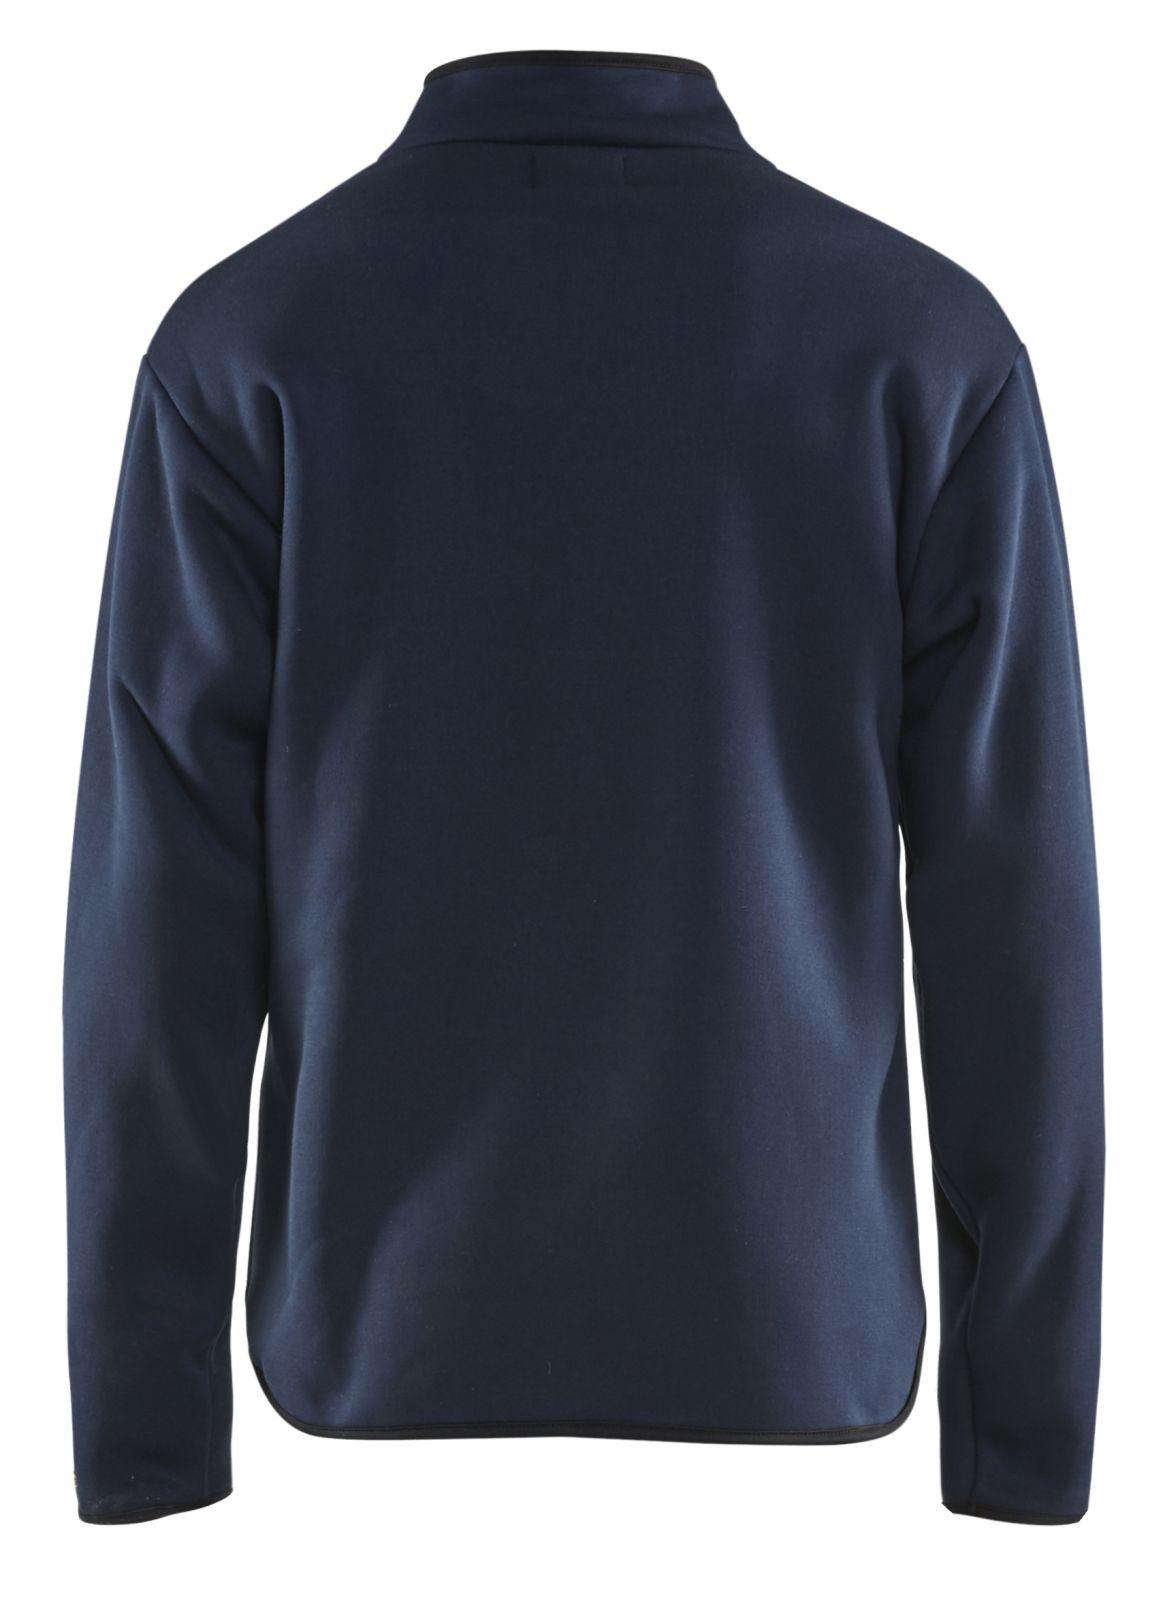 Blaklader Fleece vesten 47702954 marineblauw(8900)